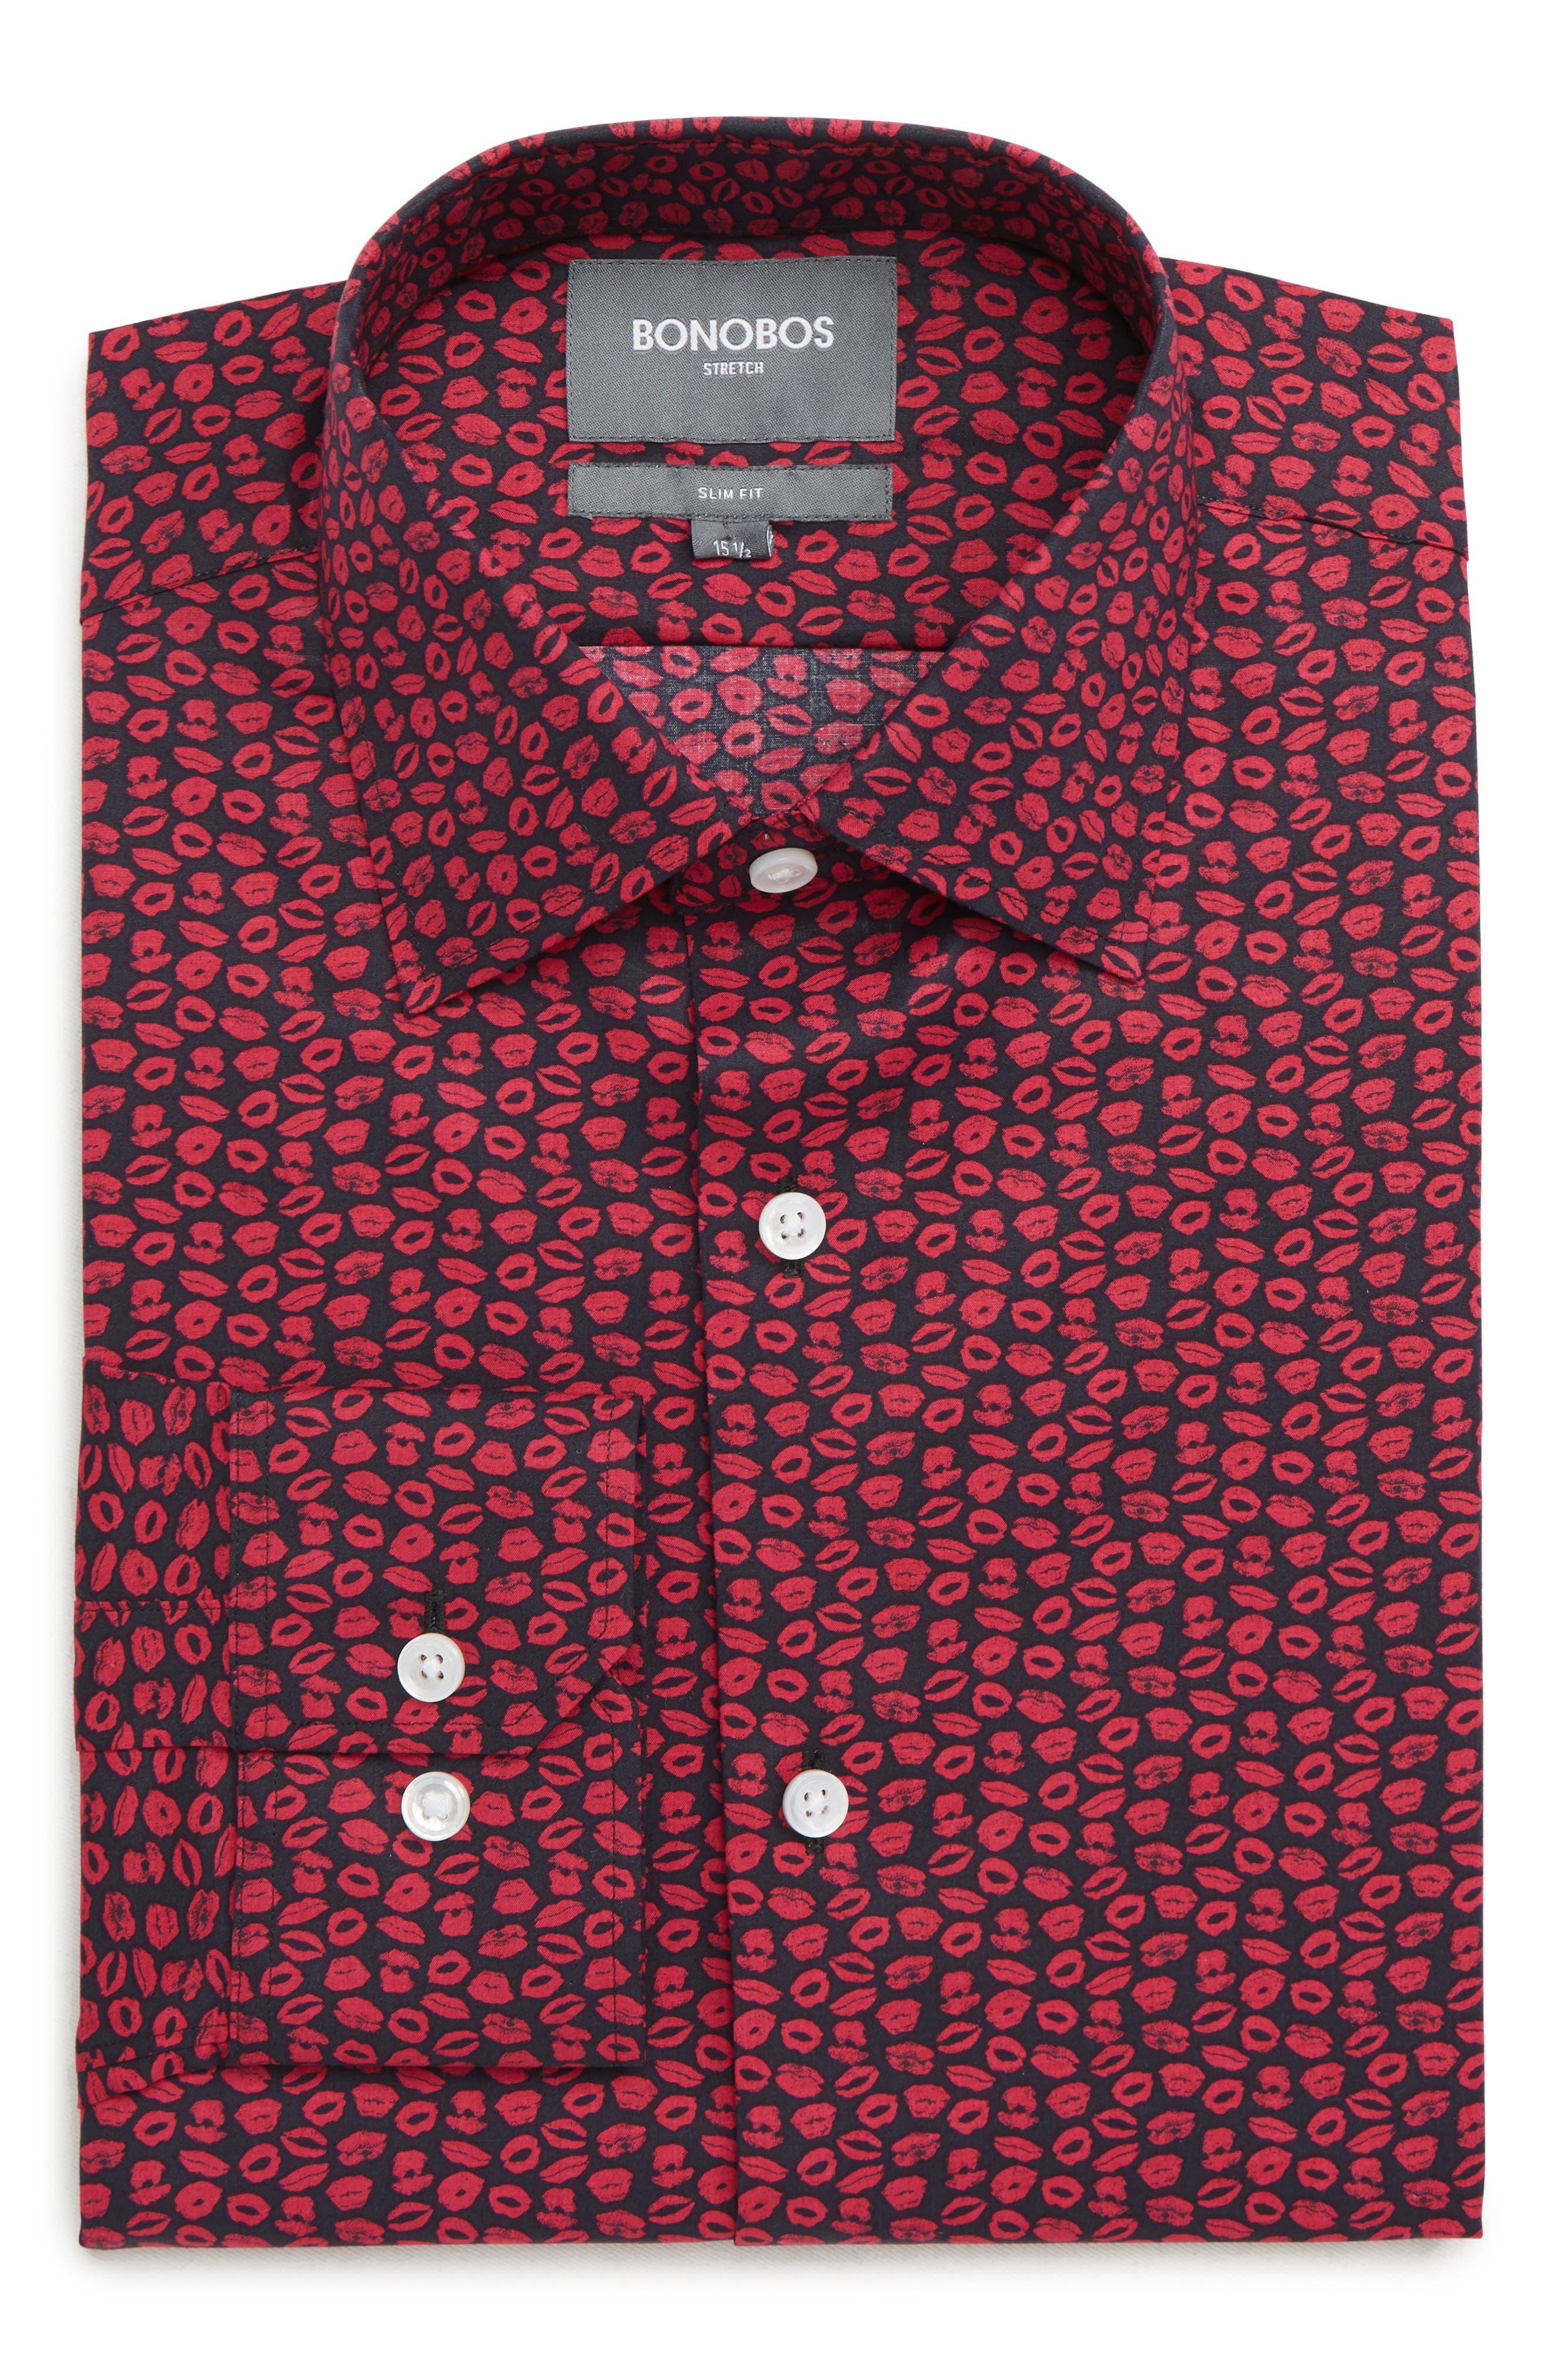 XOXO Slim Fit Stretch Print Dress Shirt,                             Main thumbnail 1, color,                             PINK